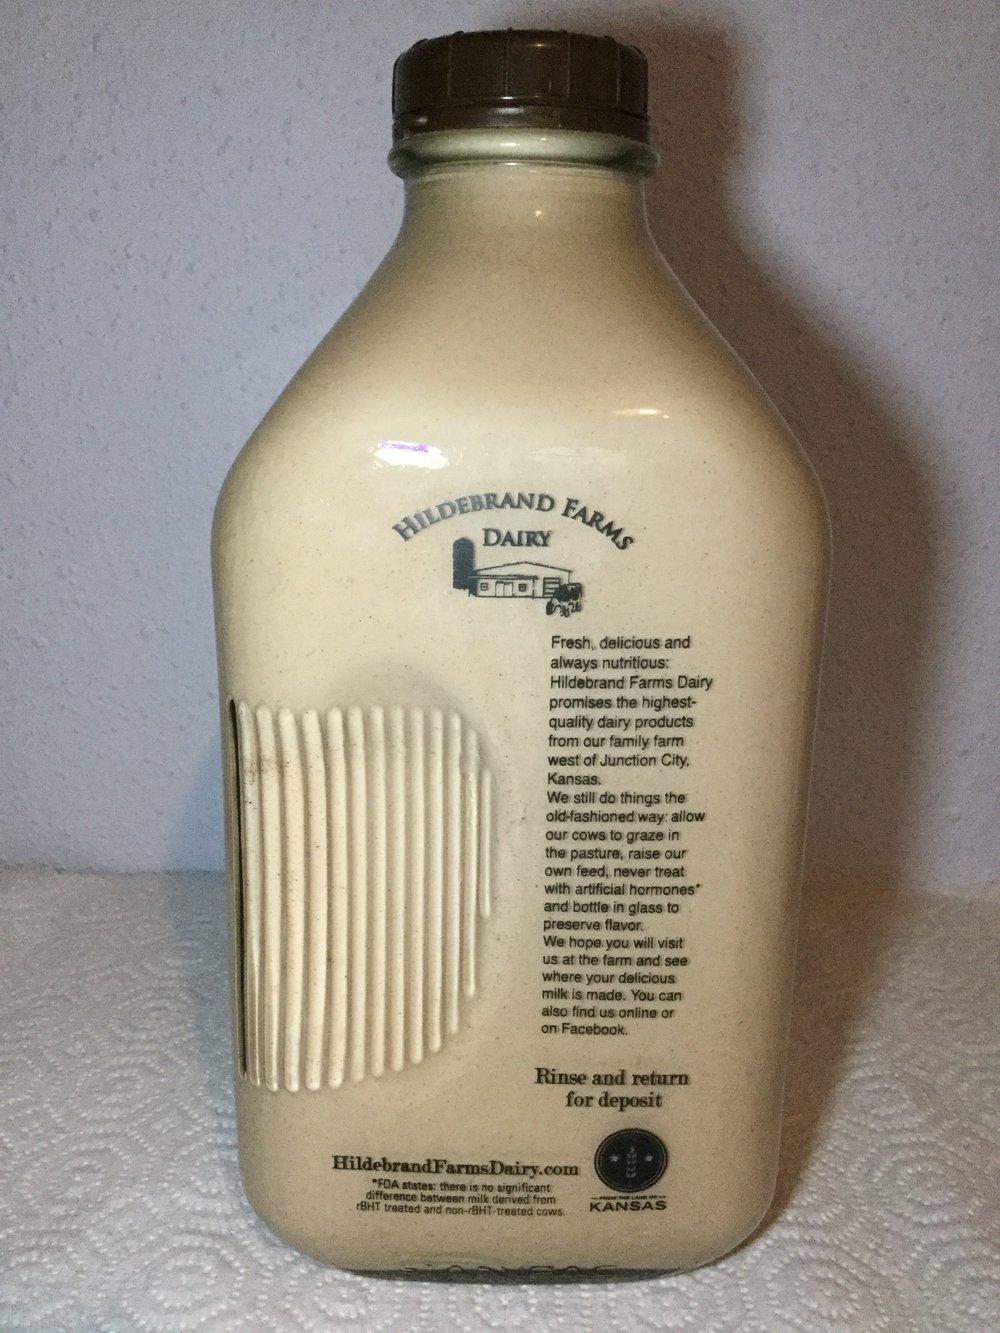 Hildebrand Farms Dairy Chocolate Milk Side 1